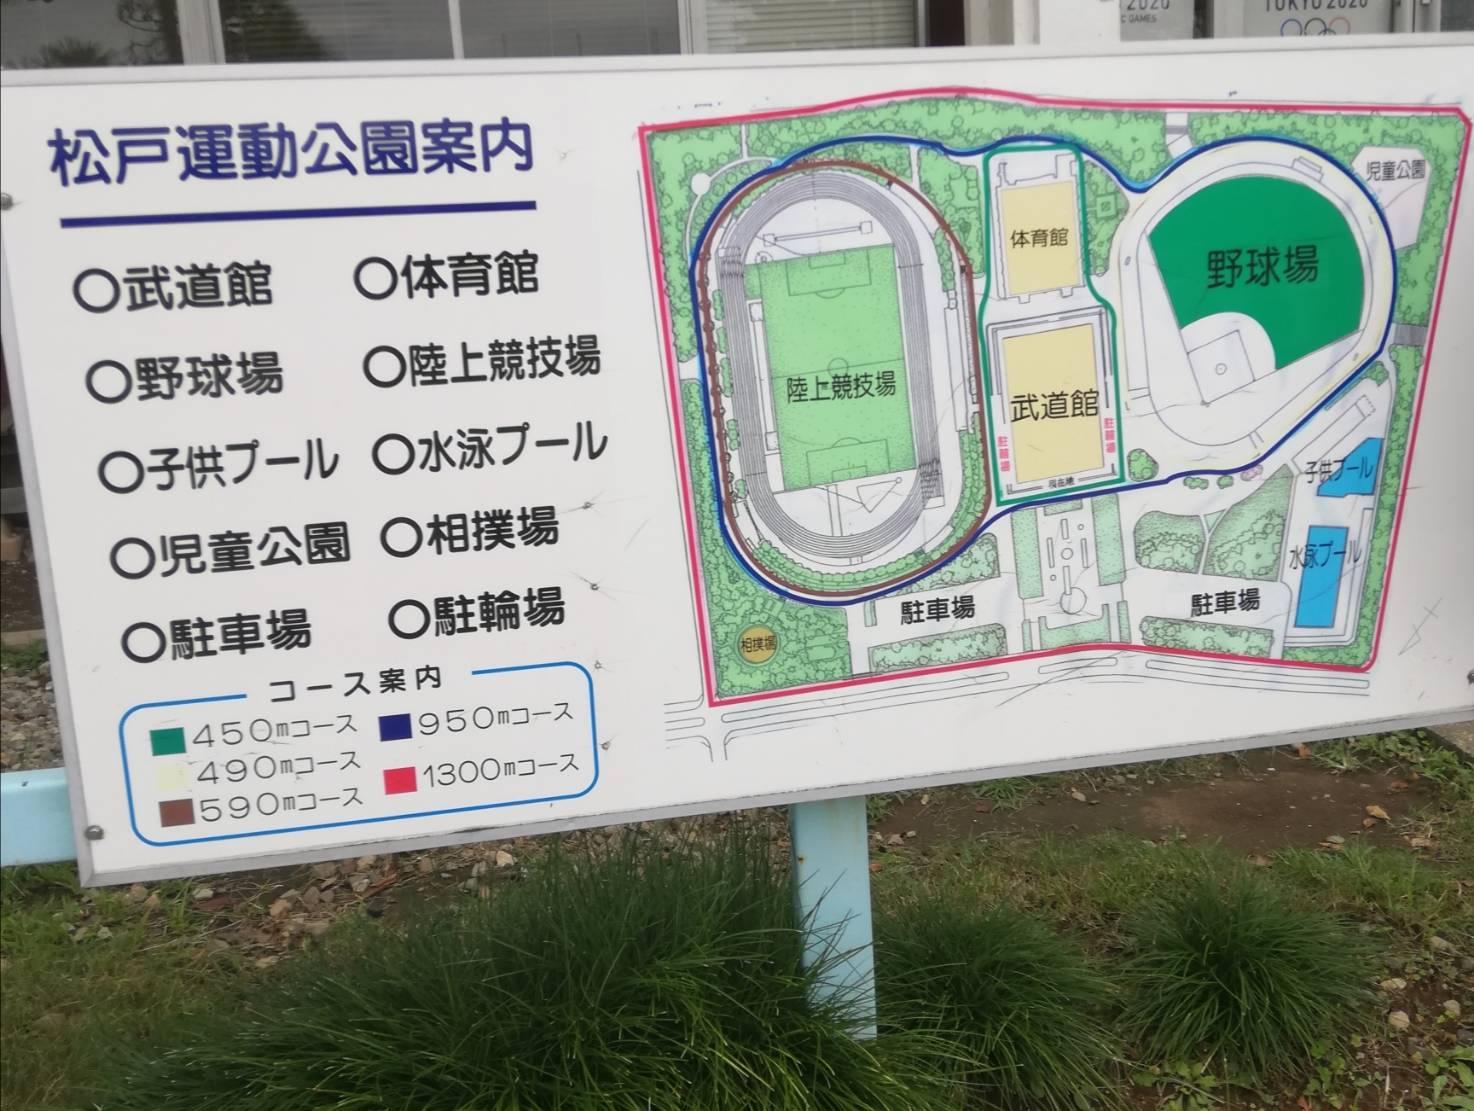 松戸陸上競技場(運動公園内)は9月1日再開予定・リニューアル概要 ...